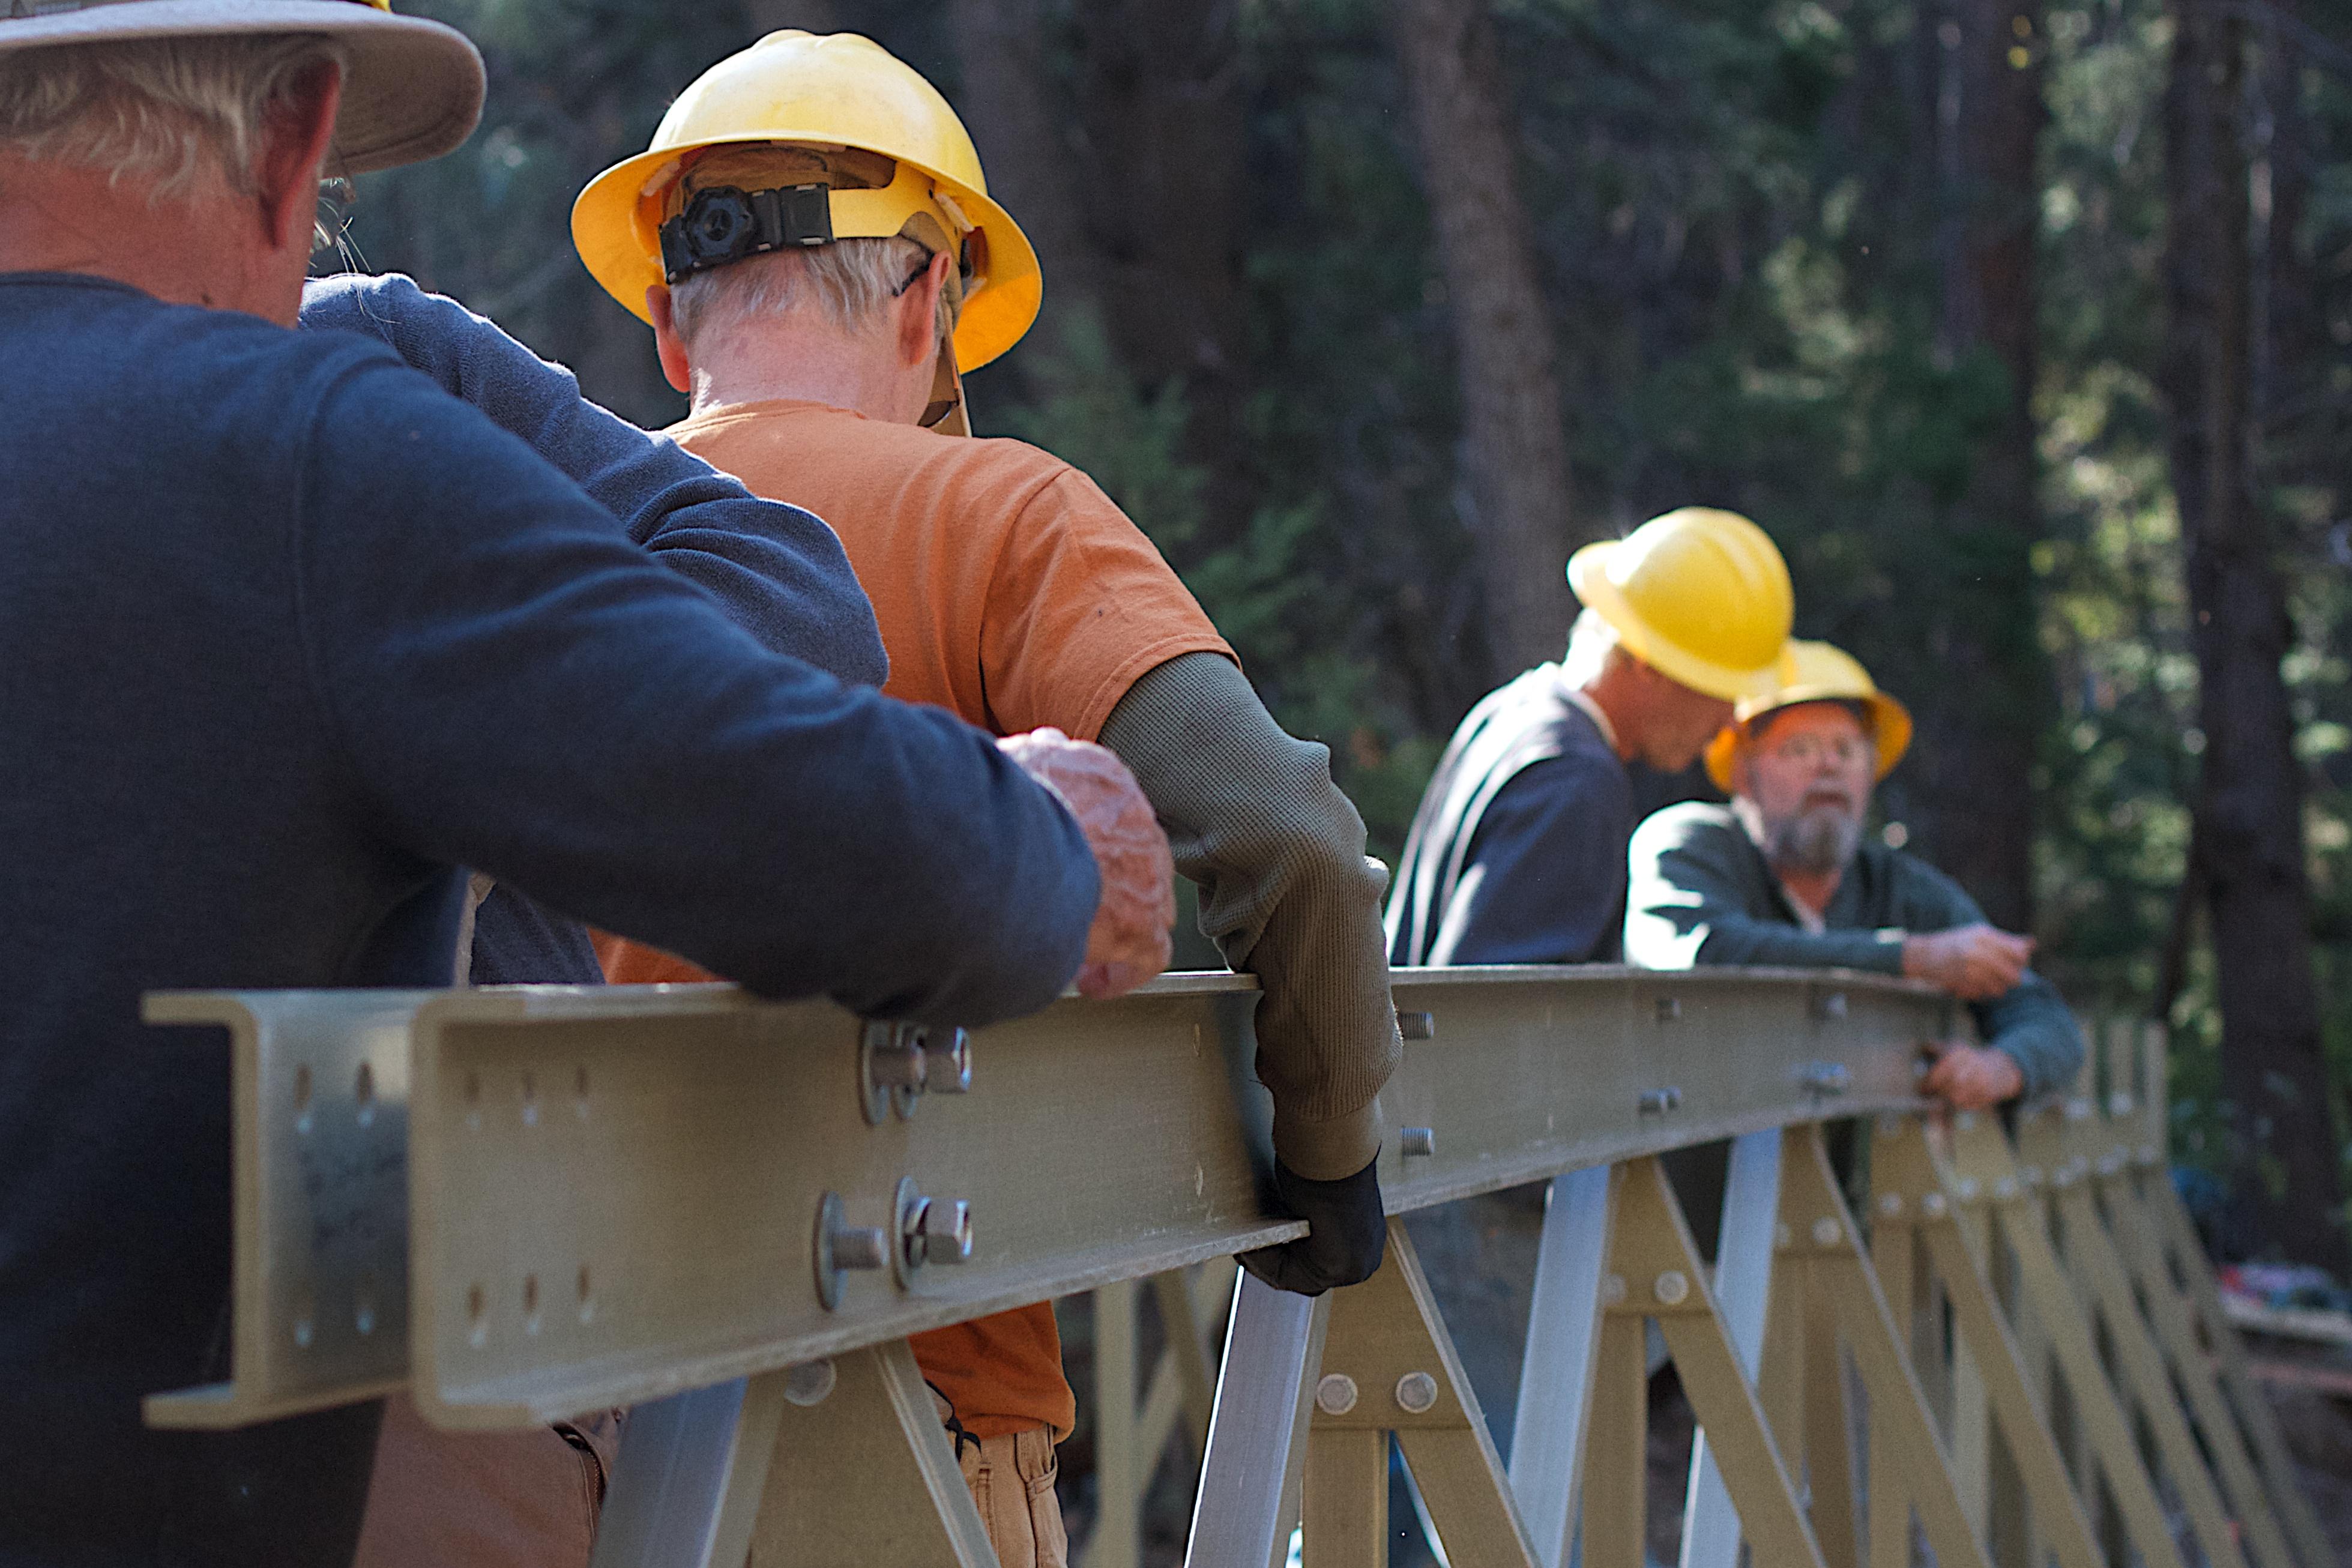 pstrails laborer construction worker